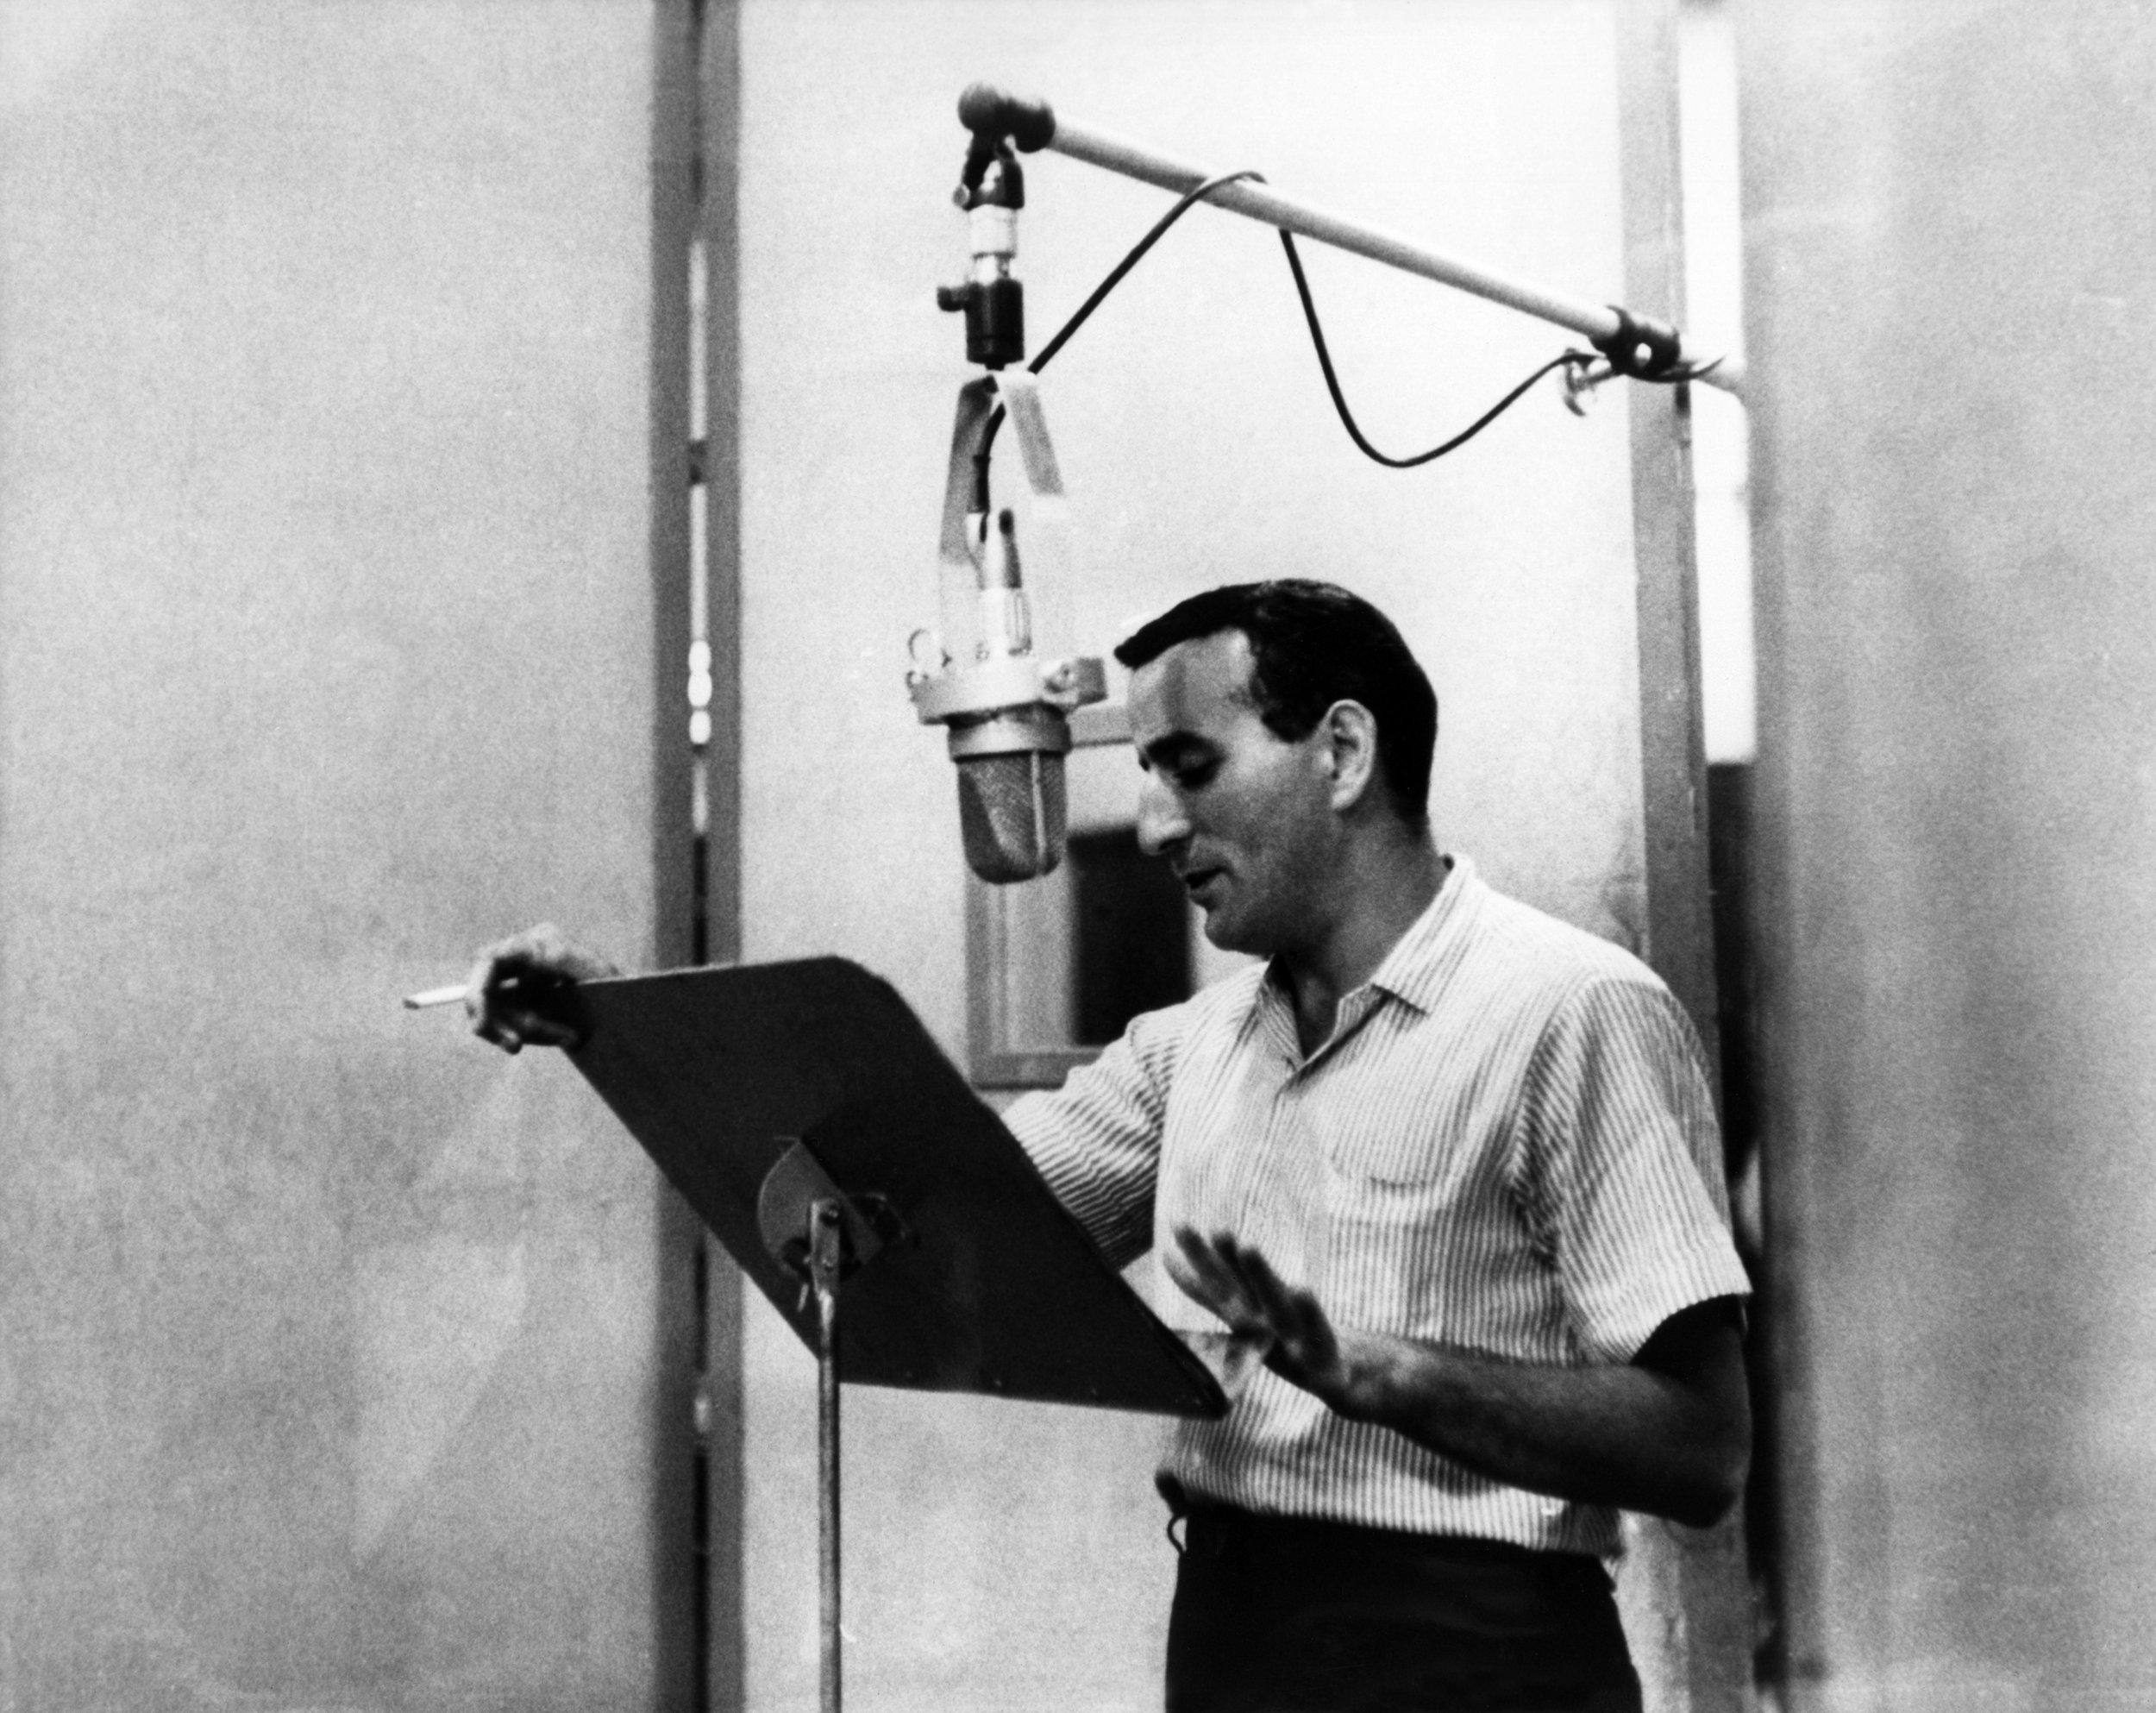 Bradley's idol, Tony Bennett, recording in about 1970